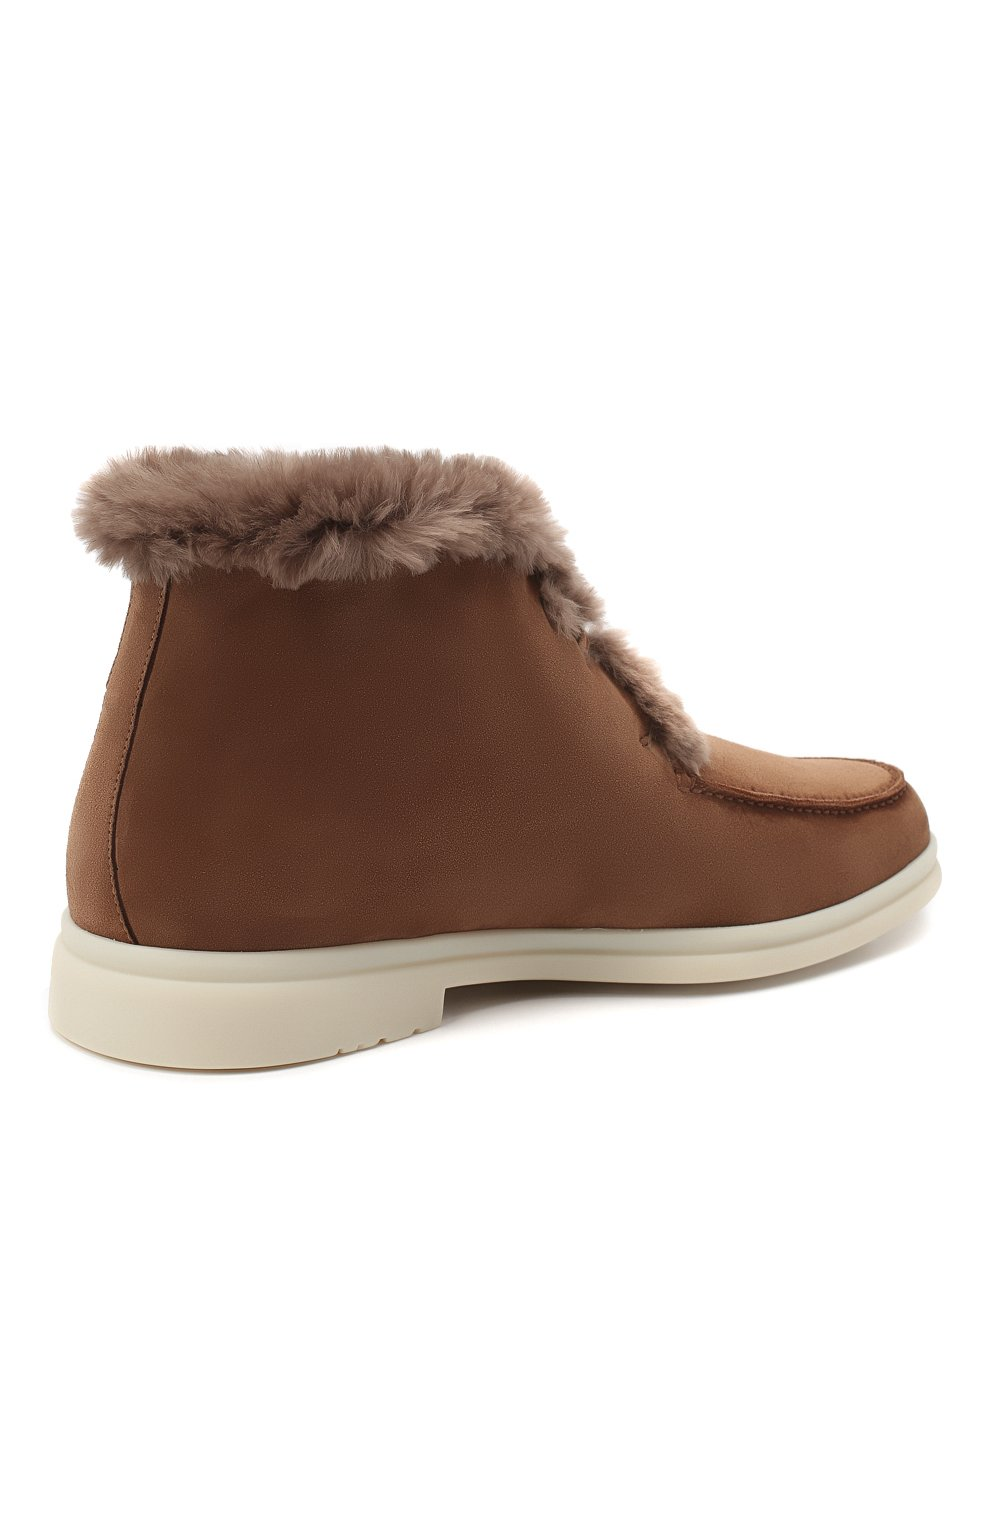 Мужские замшевые ботинки walk and walk LORO PIANA светло-коричневого цвета, арт. FAE5014 | Фото 4